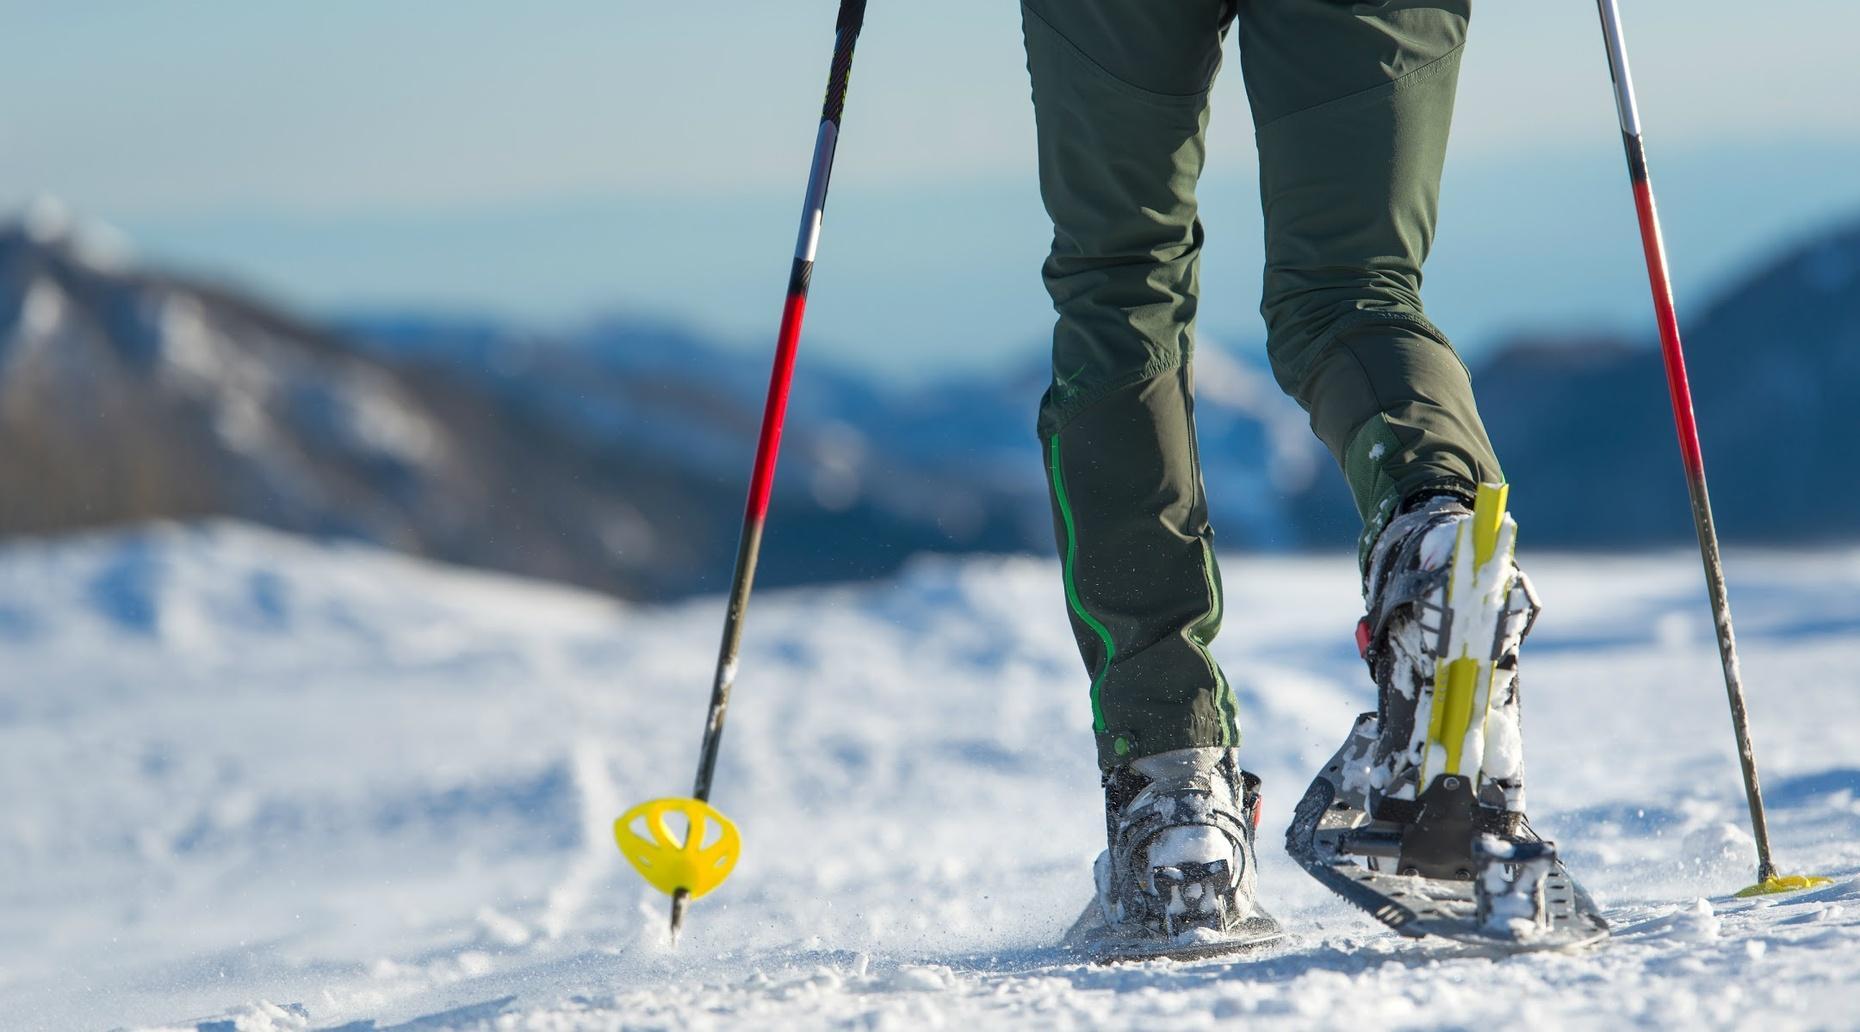 Half-Day Snowshoeing Tour in Colorado